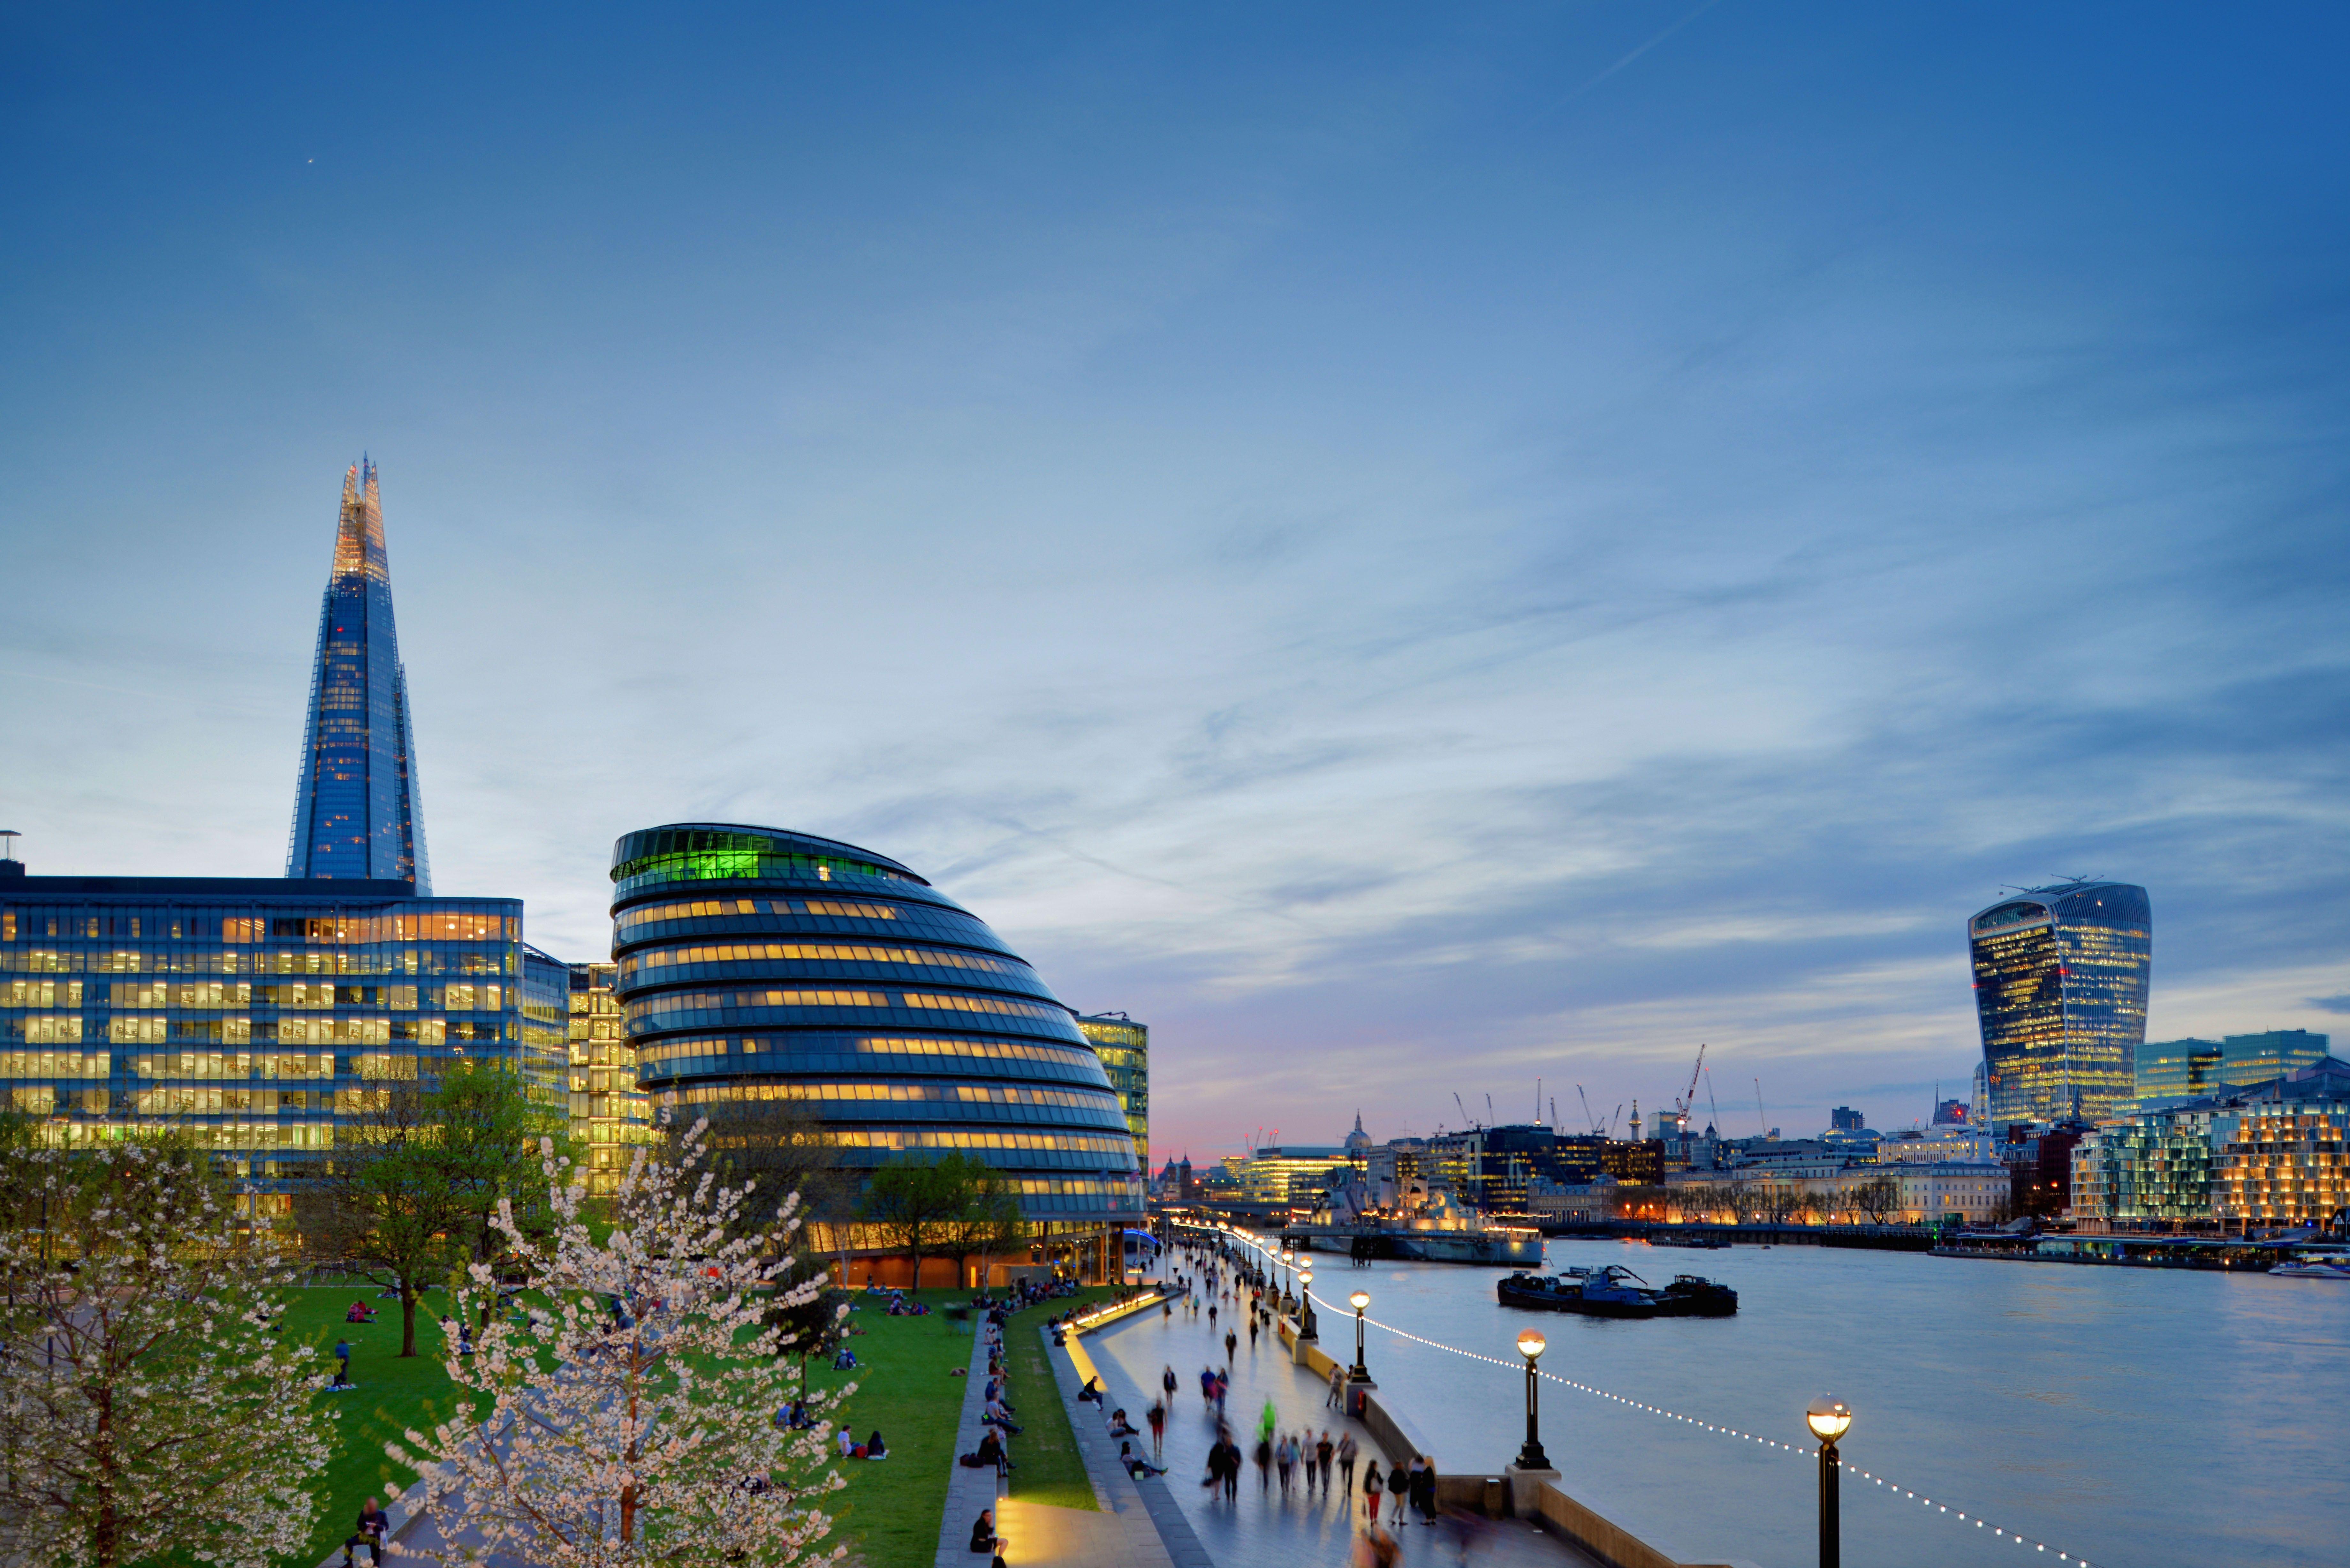 Top Photography Spots - London, UK - HDRshooter